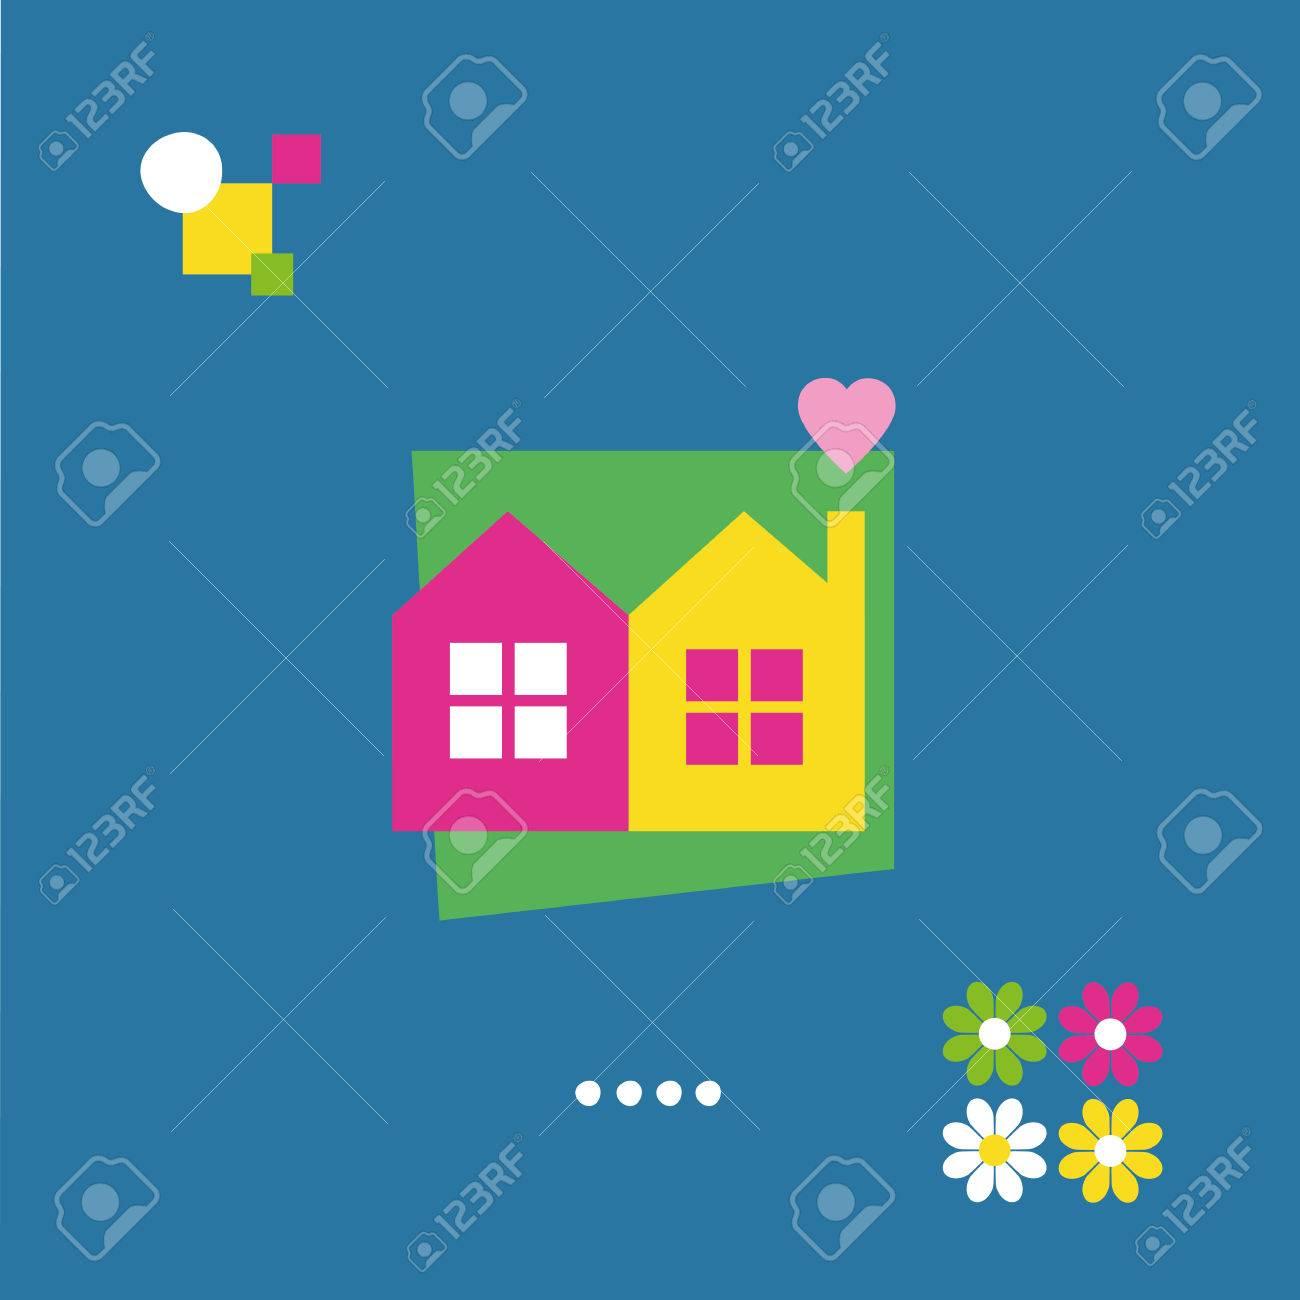 Housewarming greeting card royalty free cliparts vectors and housewarming greeting card stock vector 29952647 kristyandbryce Image collections